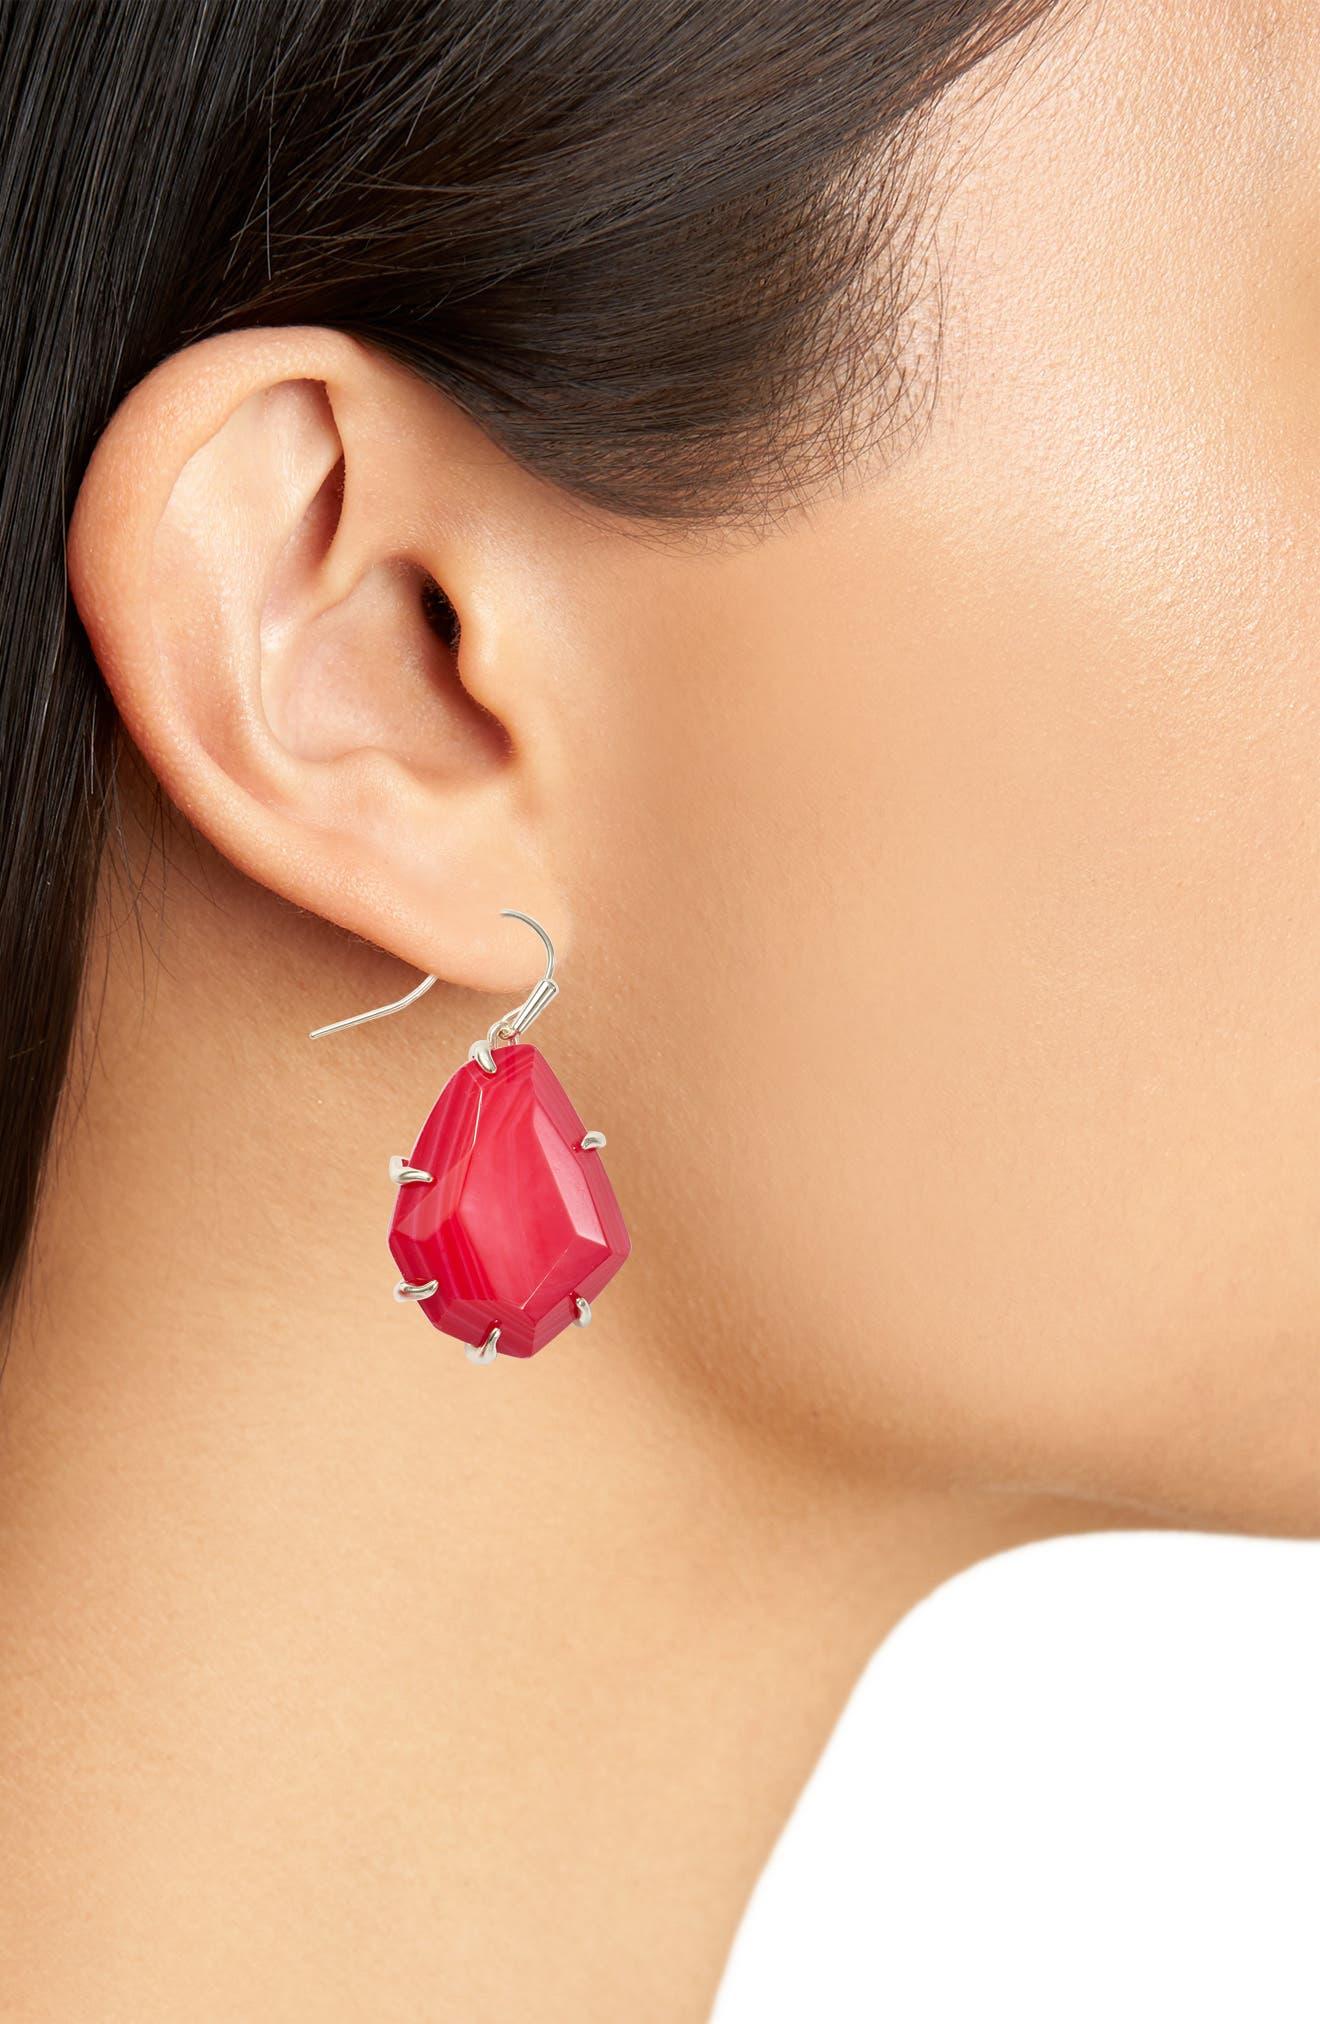 Rosenell Stone Earrings,                             Alternate thumbnail 2, color,                             Red Mop/ Gold